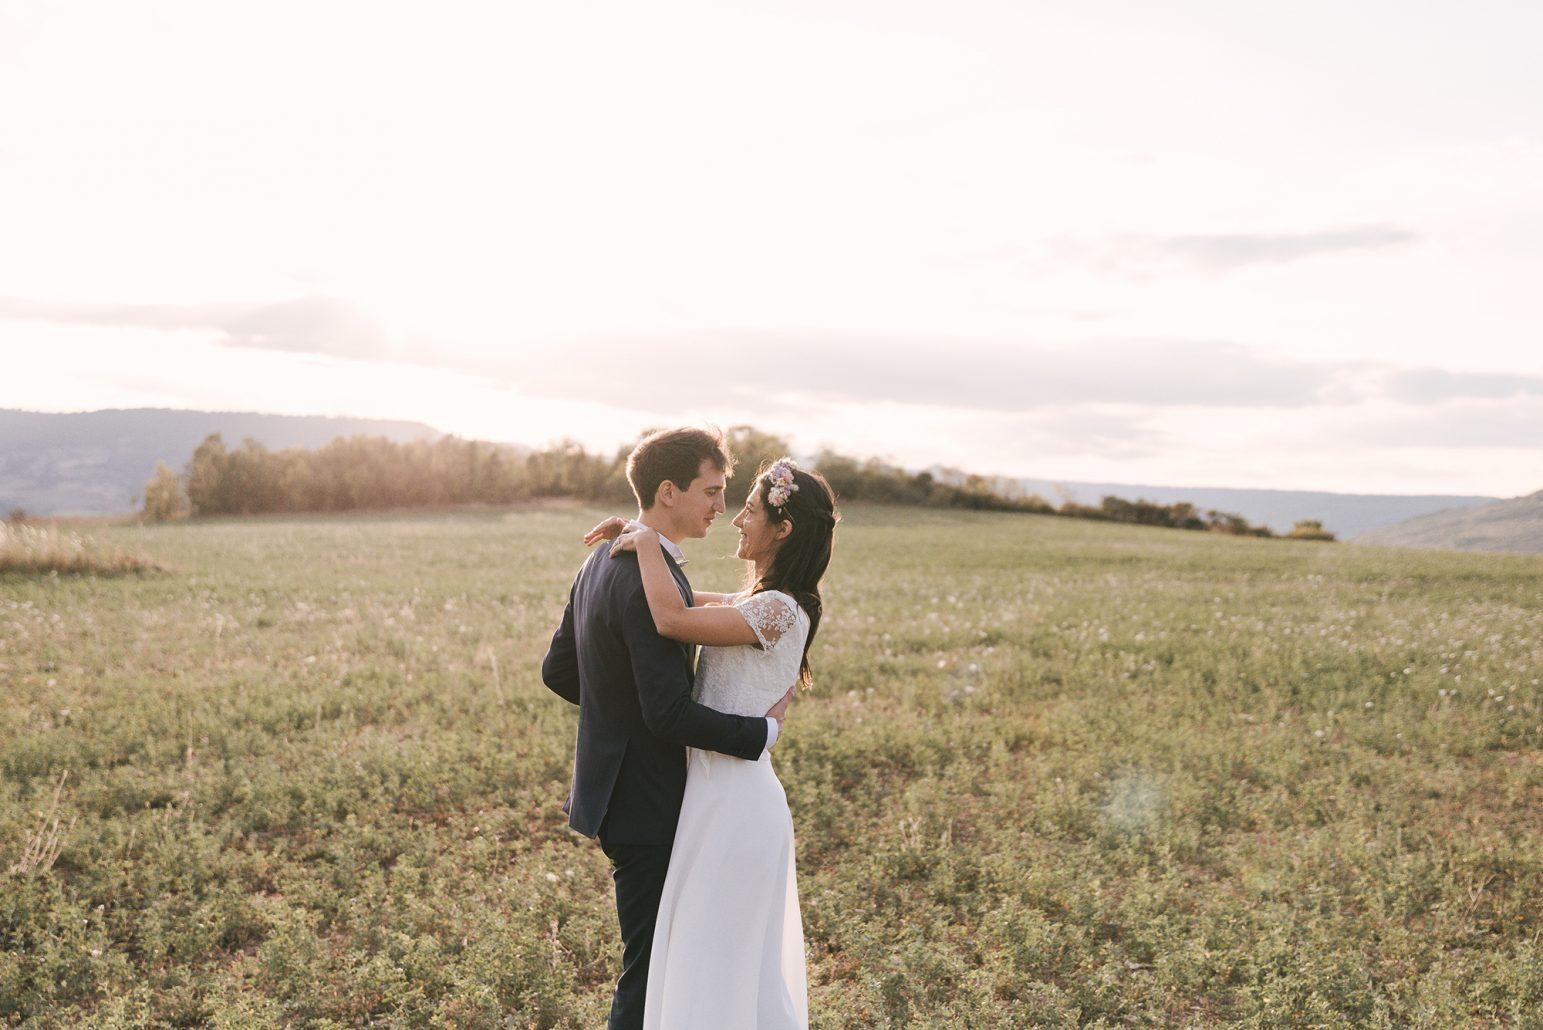 slider-photographe-mariage-grenoble-lyon (5)